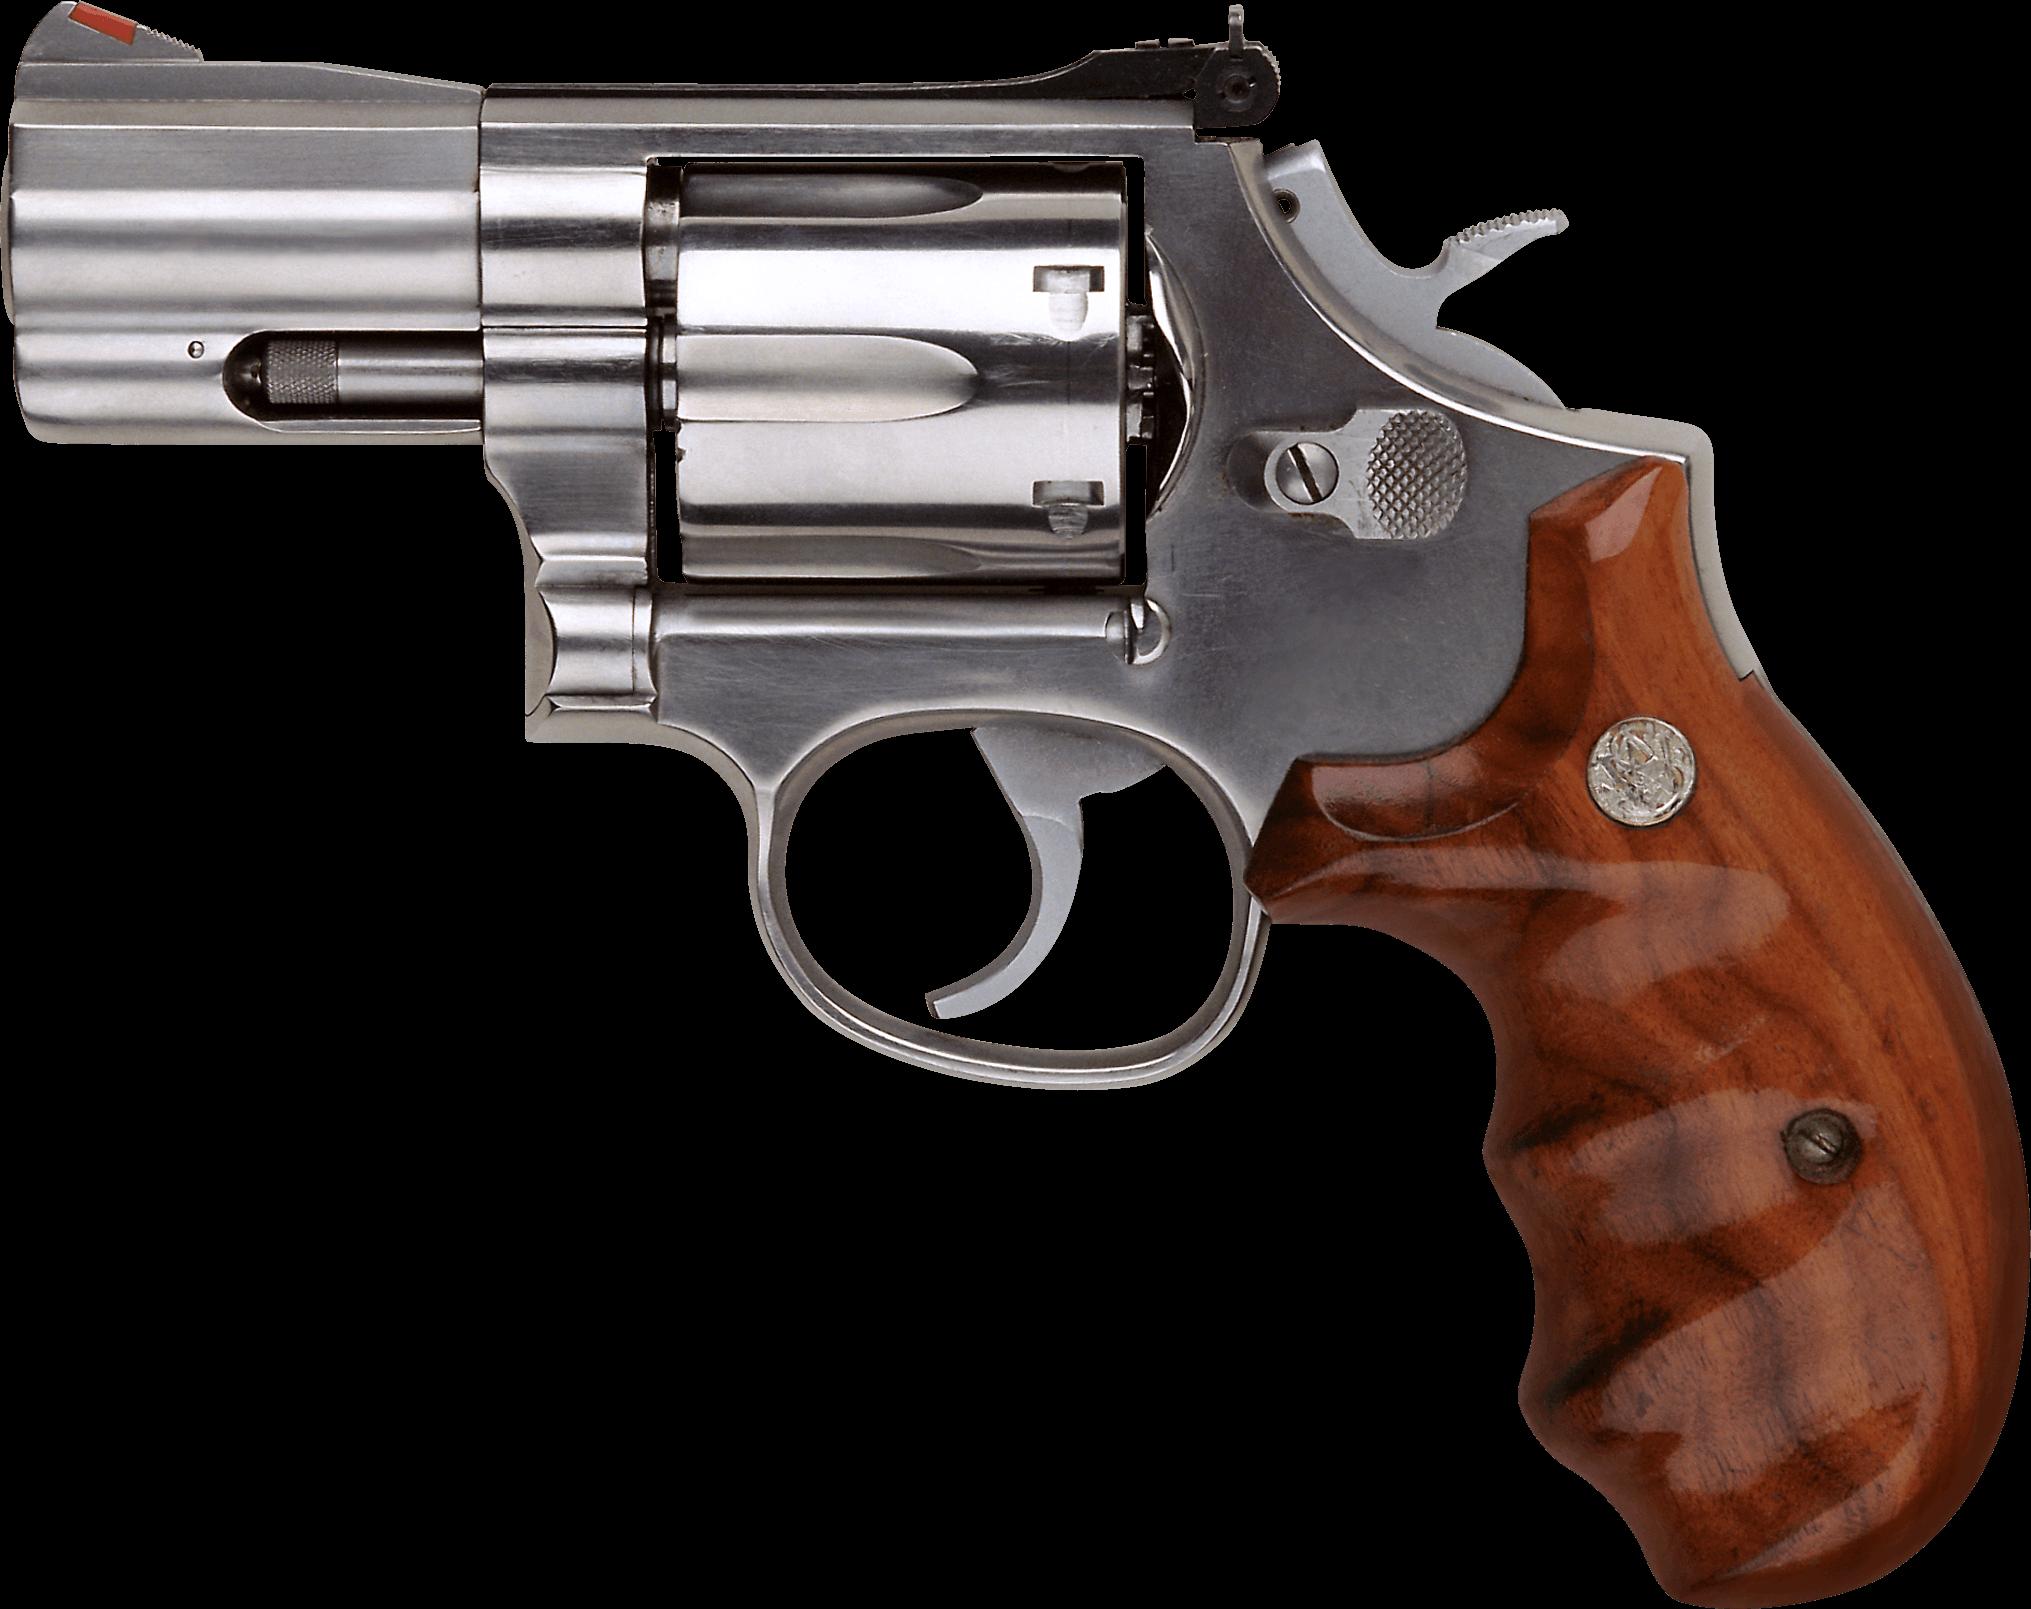 Small revolver handgun png. Clipart gun transparent background